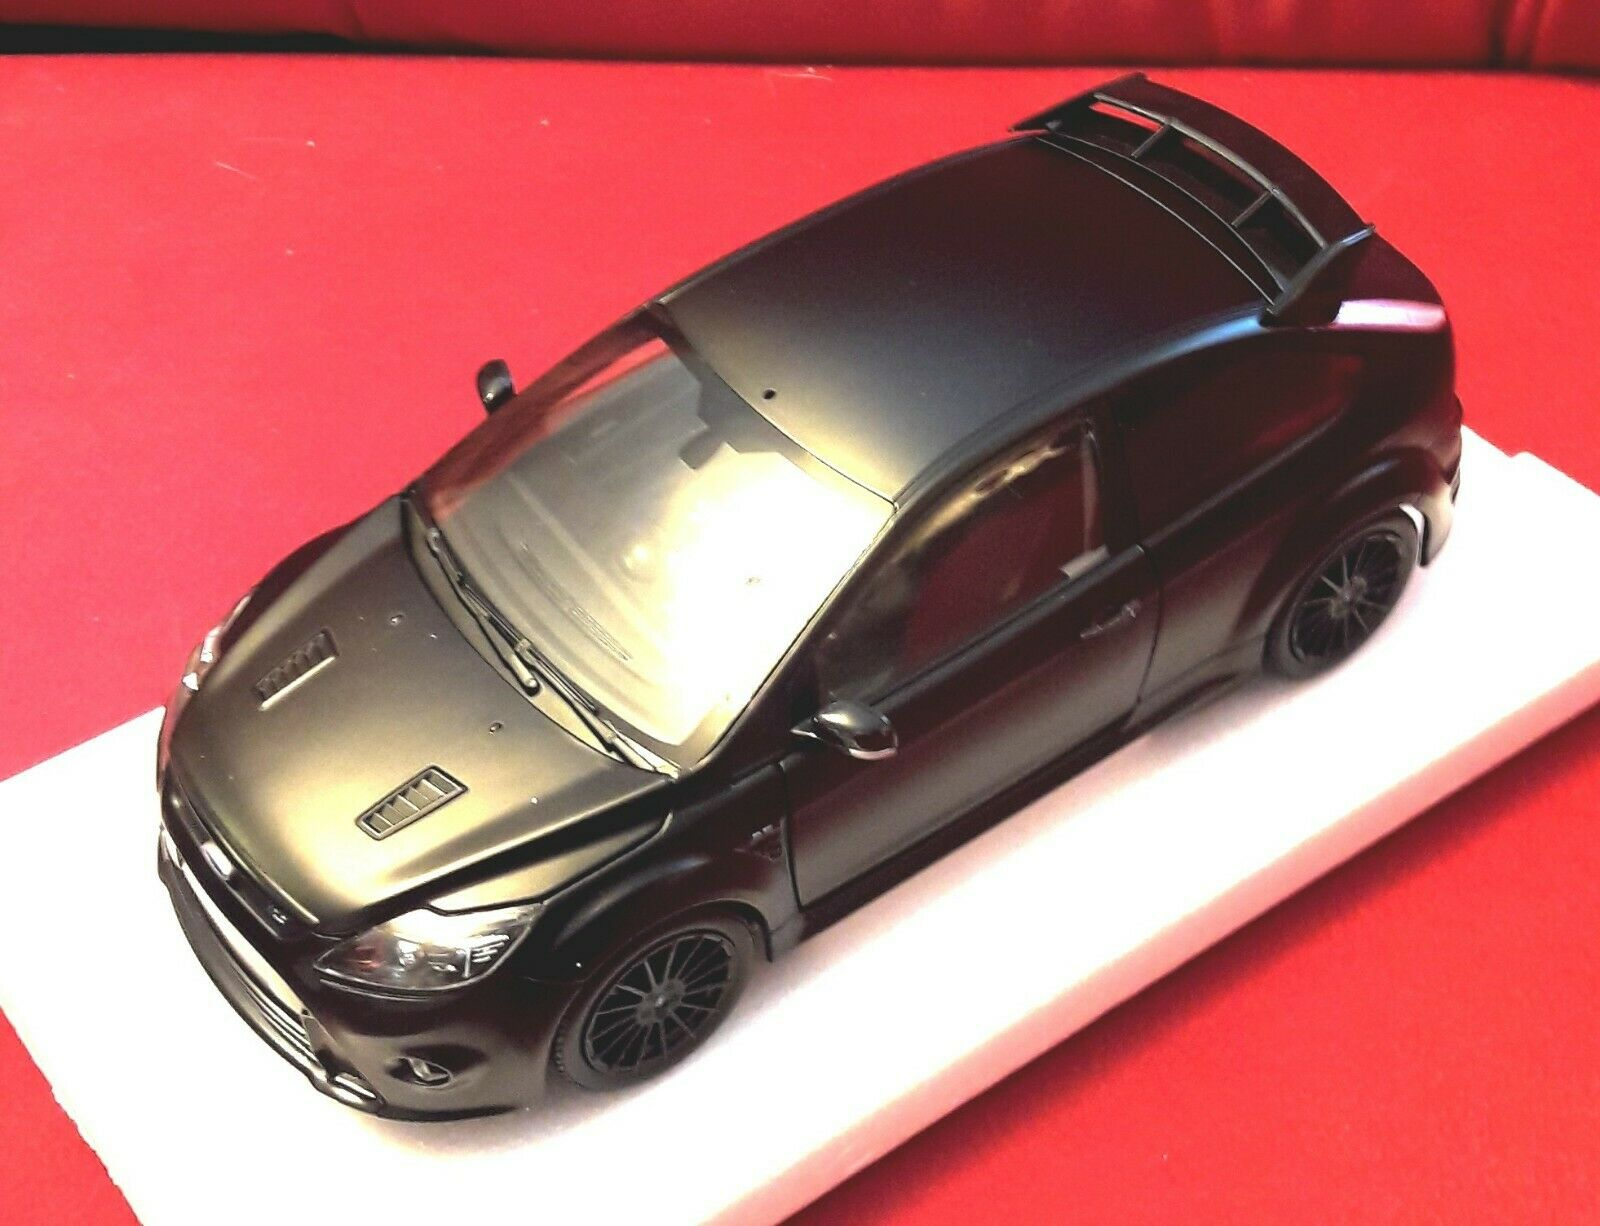 MINICHAMPS 100080000 Ford Focus RS500, 1 18, mb, Zustand  NEU